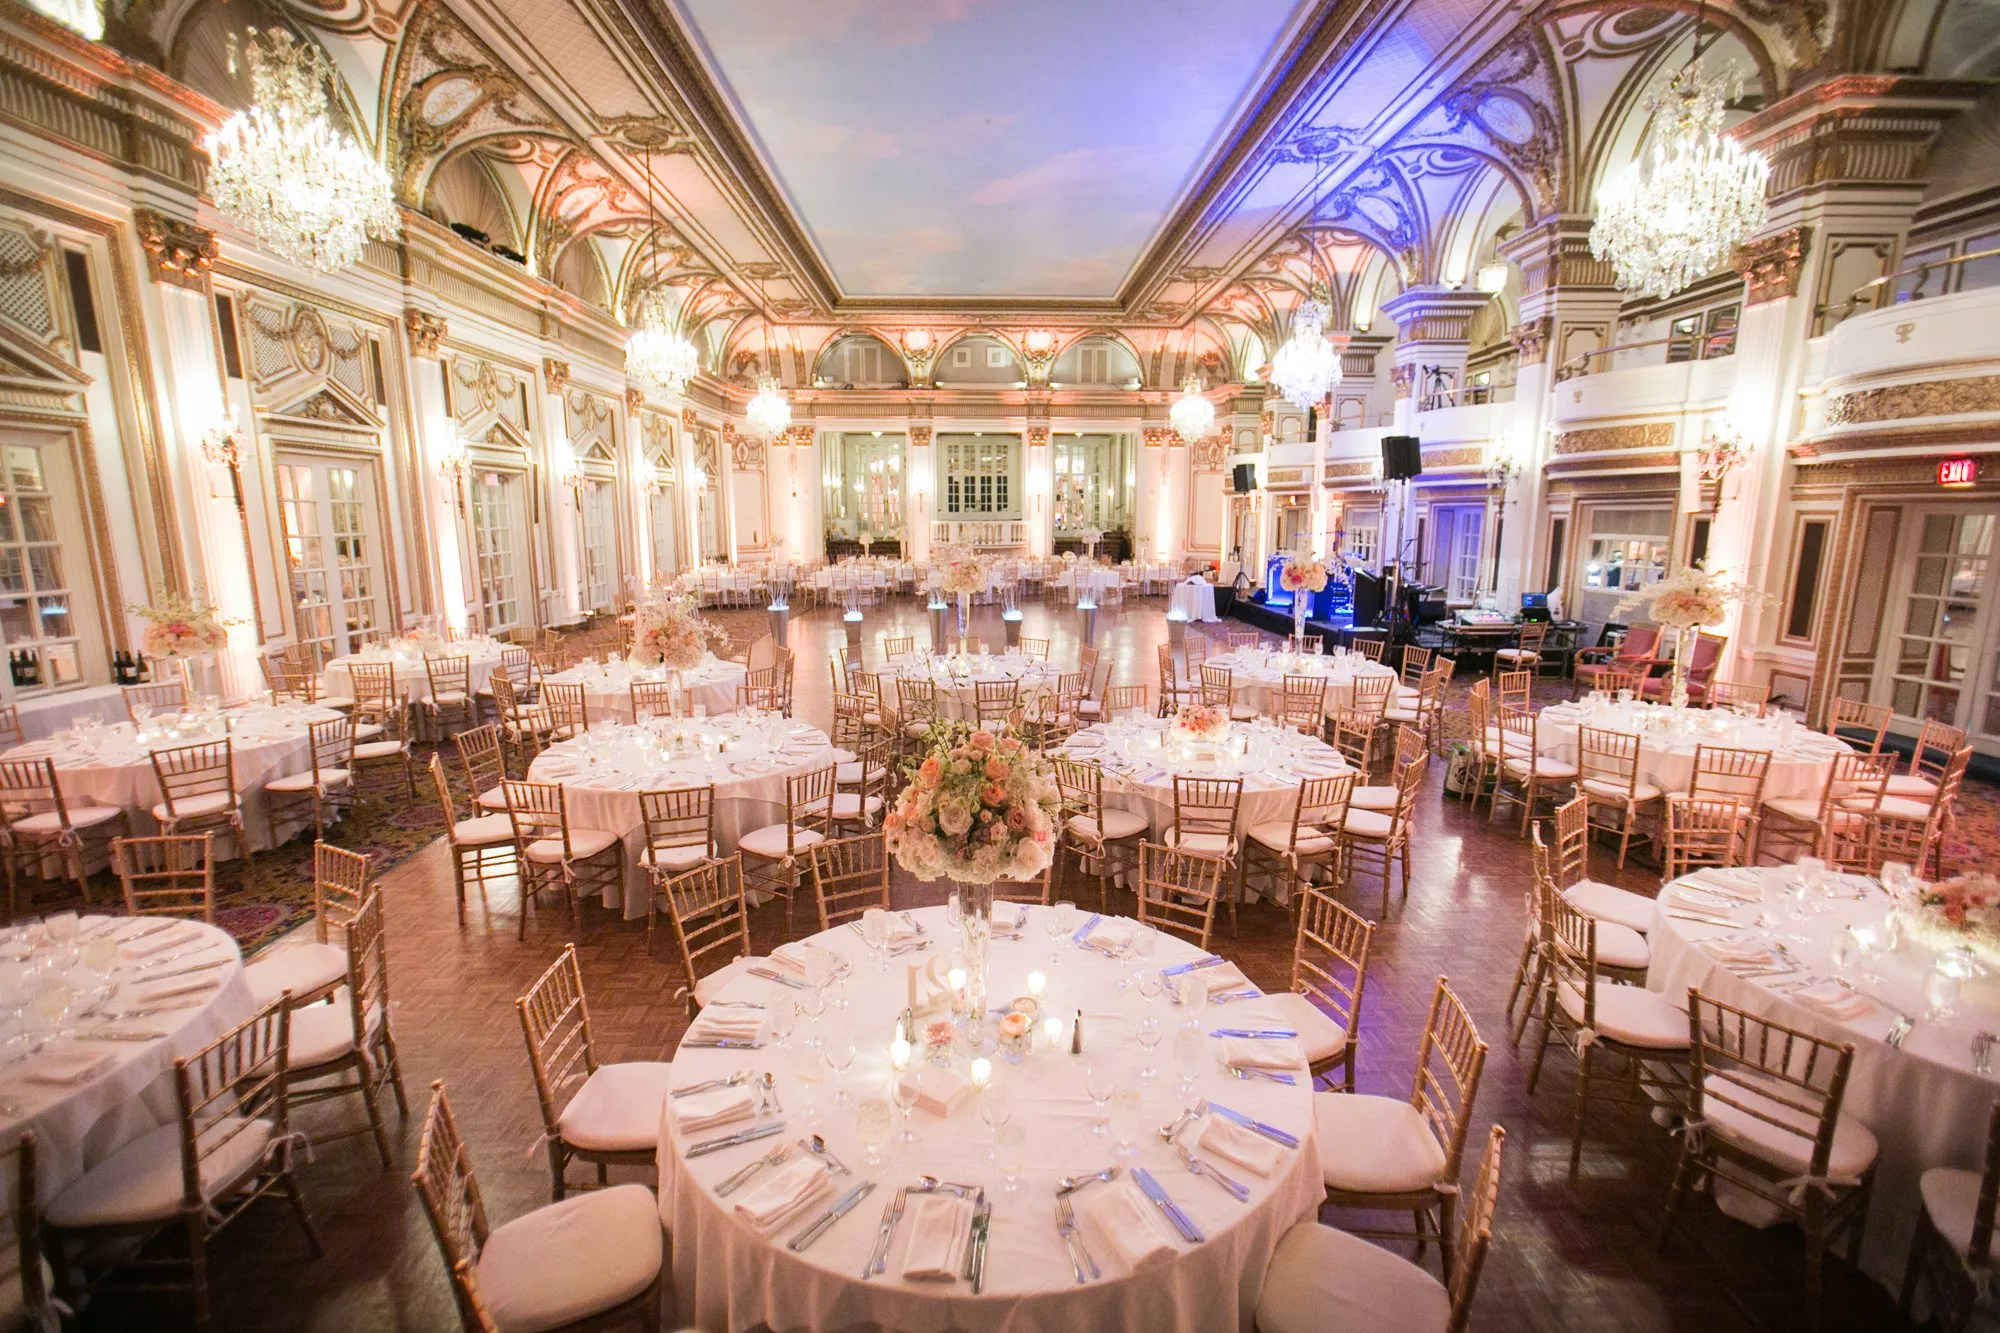 The Fairmont Copley Plaza Ballroom Wedding Reception